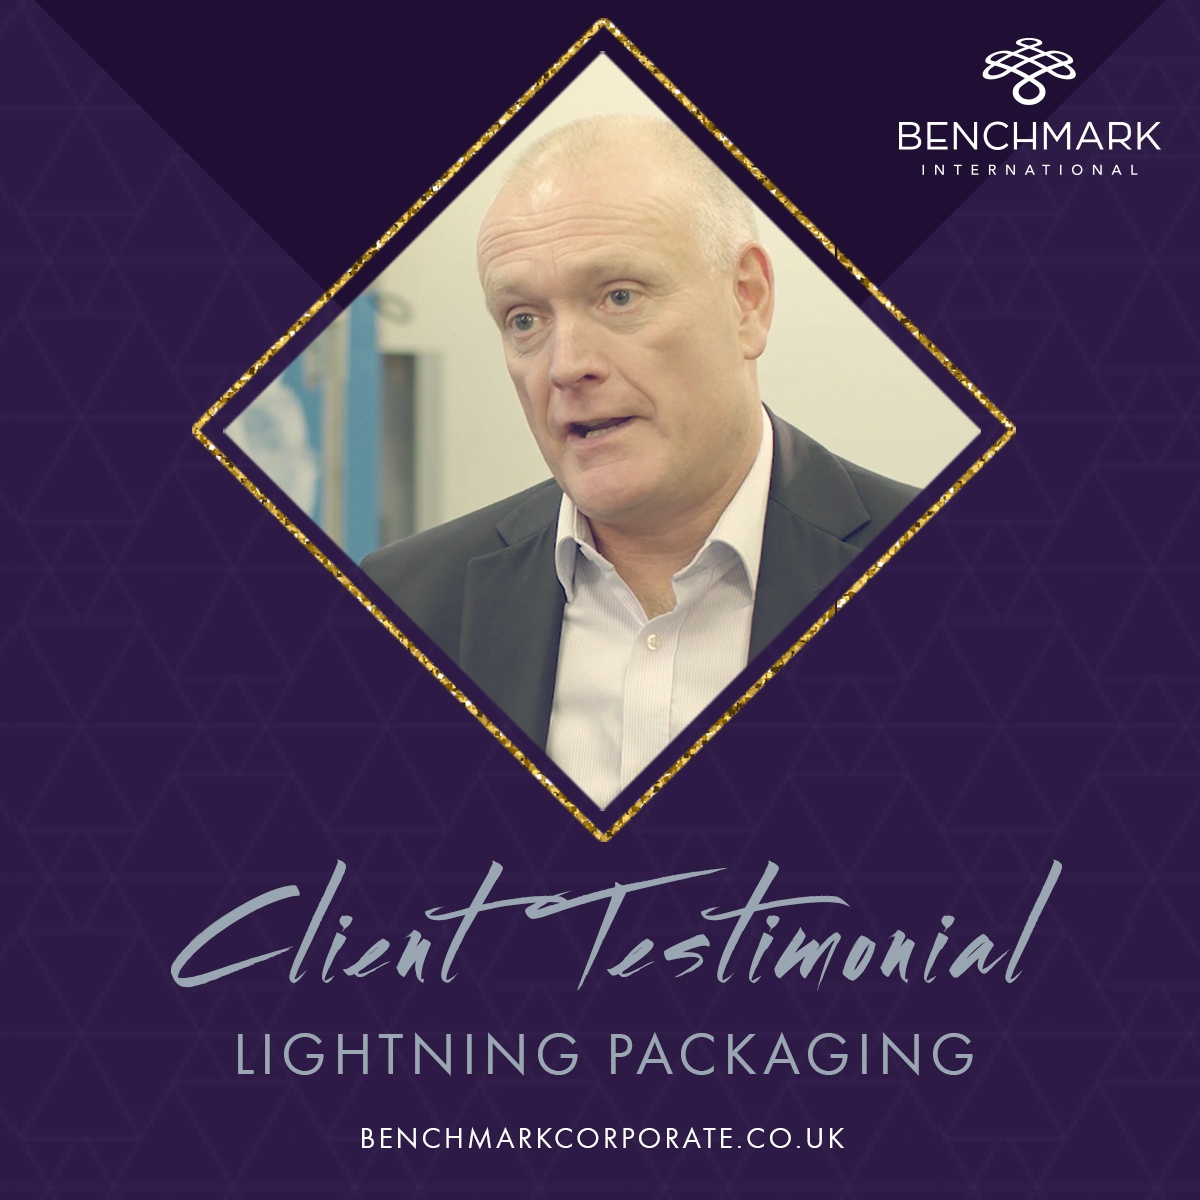 testimonial-social-image-lightning